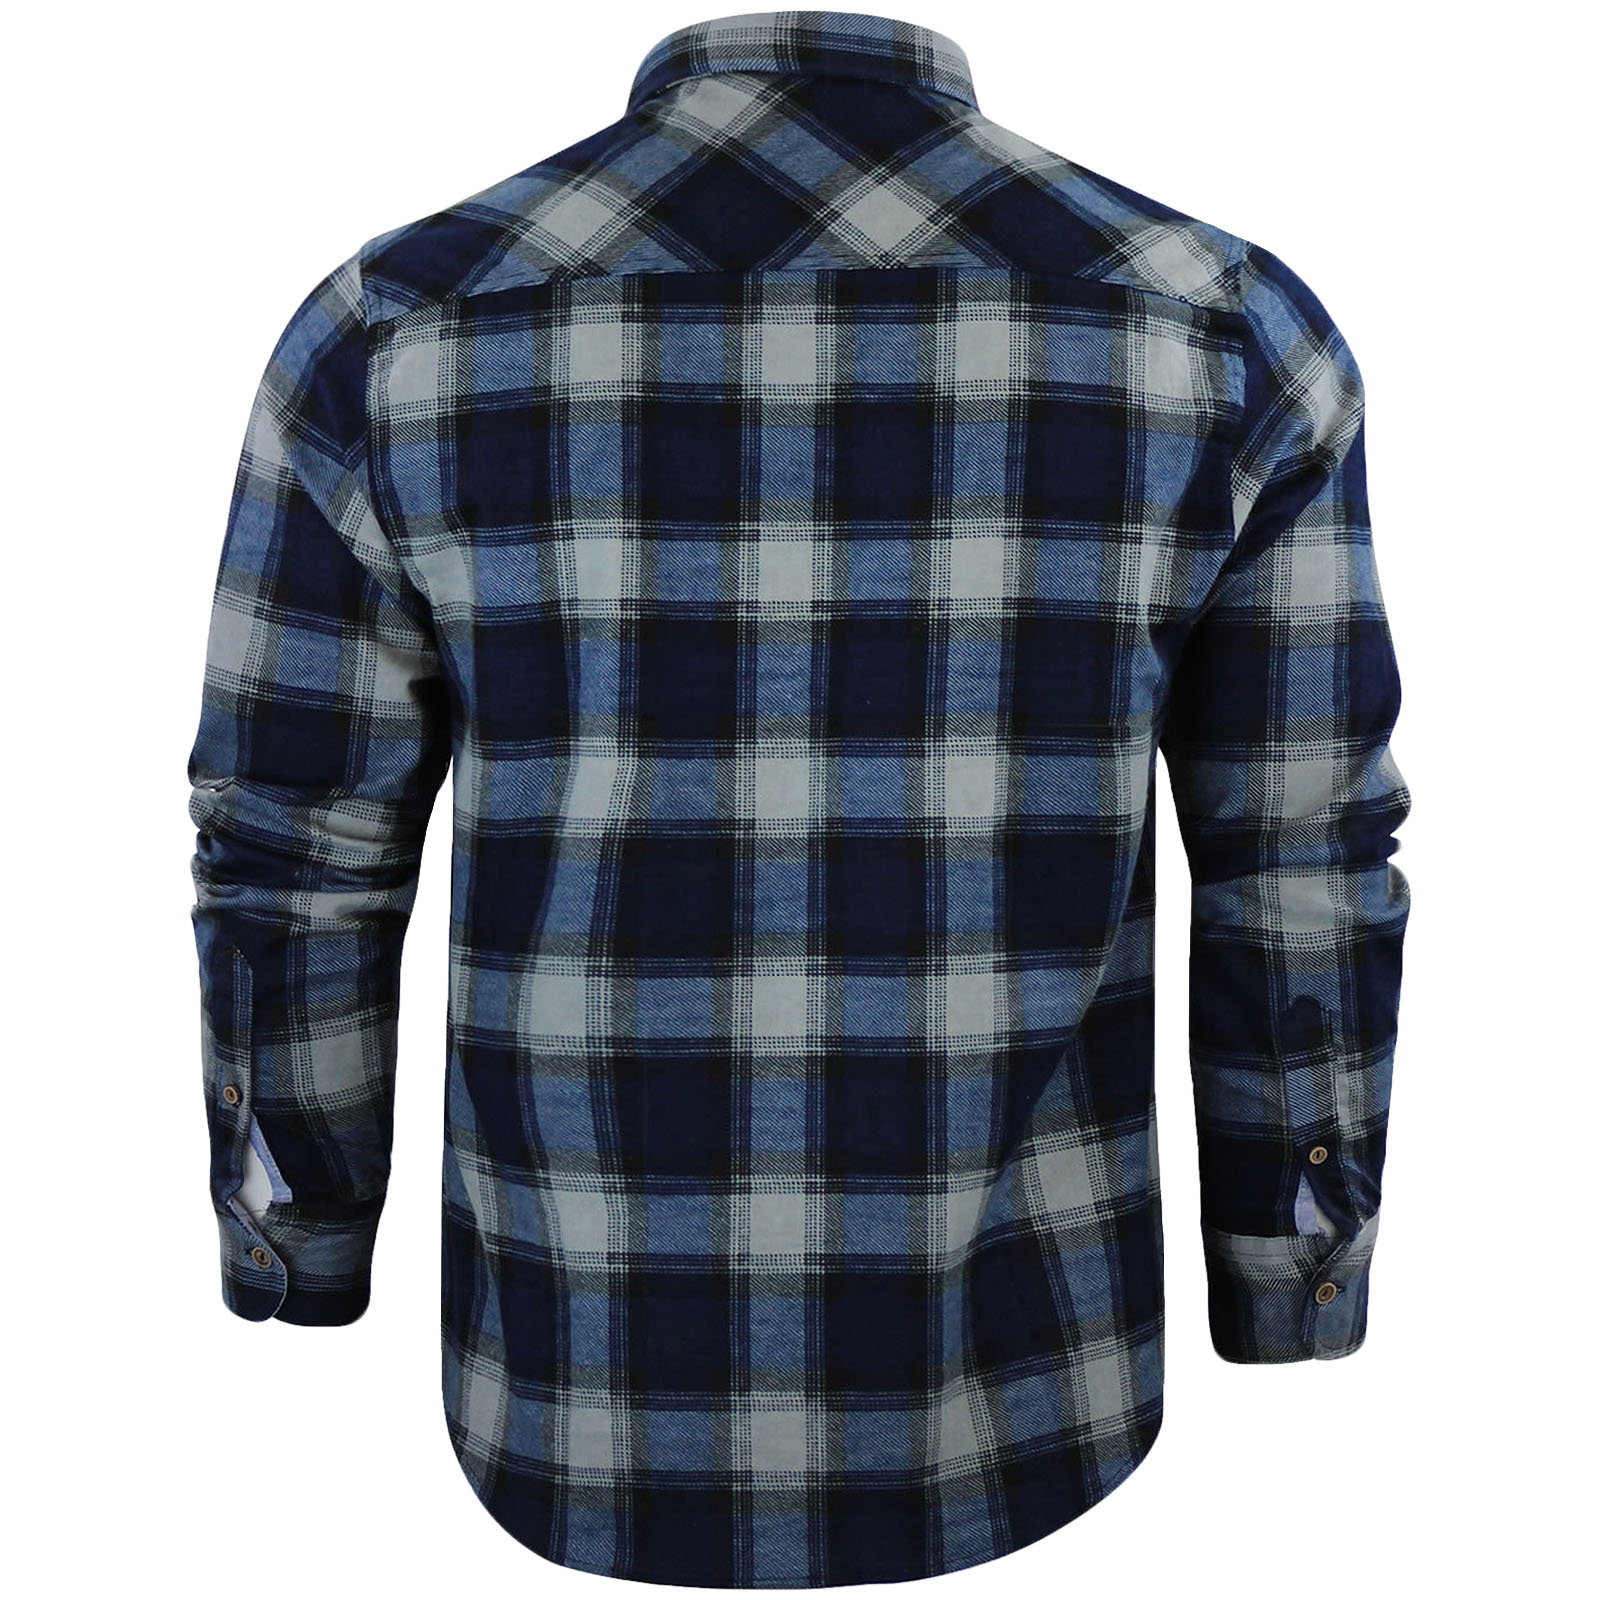 Brave-Soul-Mens-Garfield-Check-Checkered-Casual-Long-Sleeve-Lumberjack-Shirt-Top